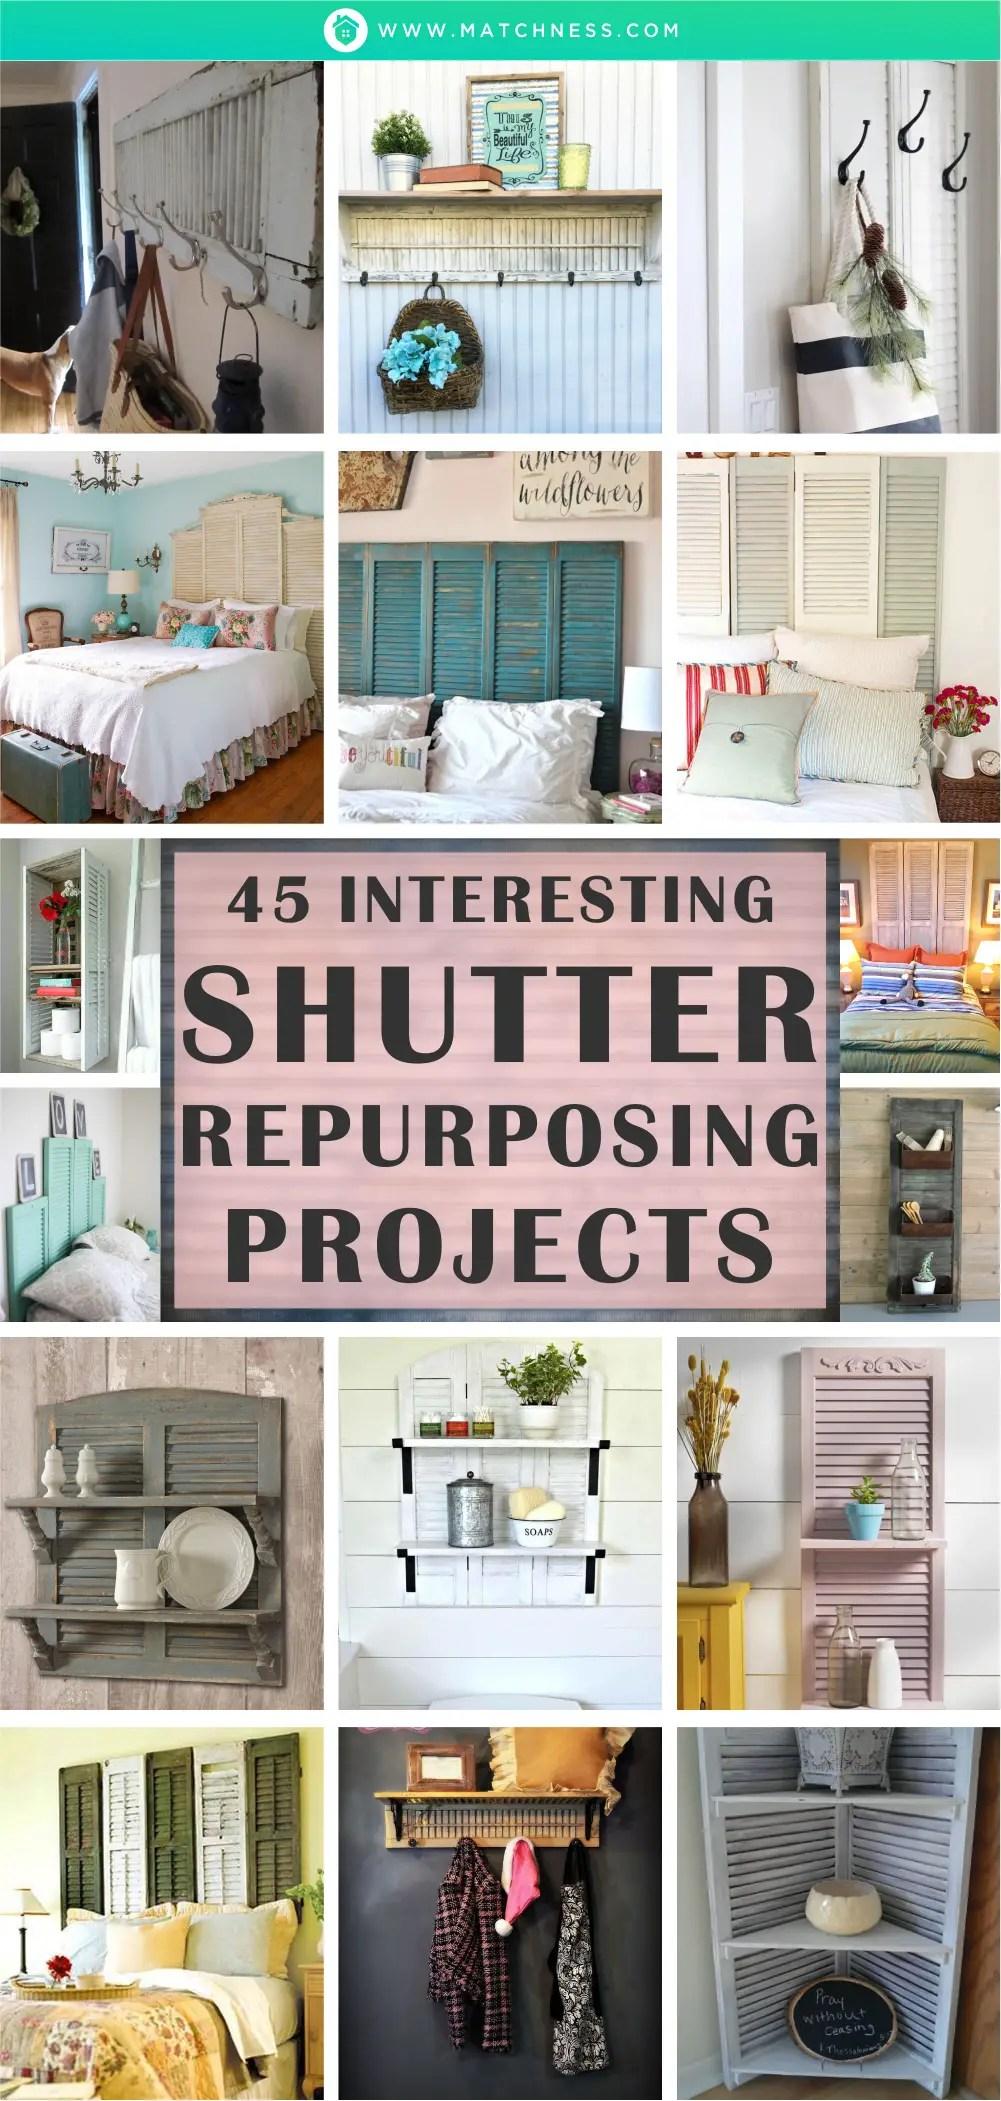 45-interesting-shutter-repurposing-projects-1